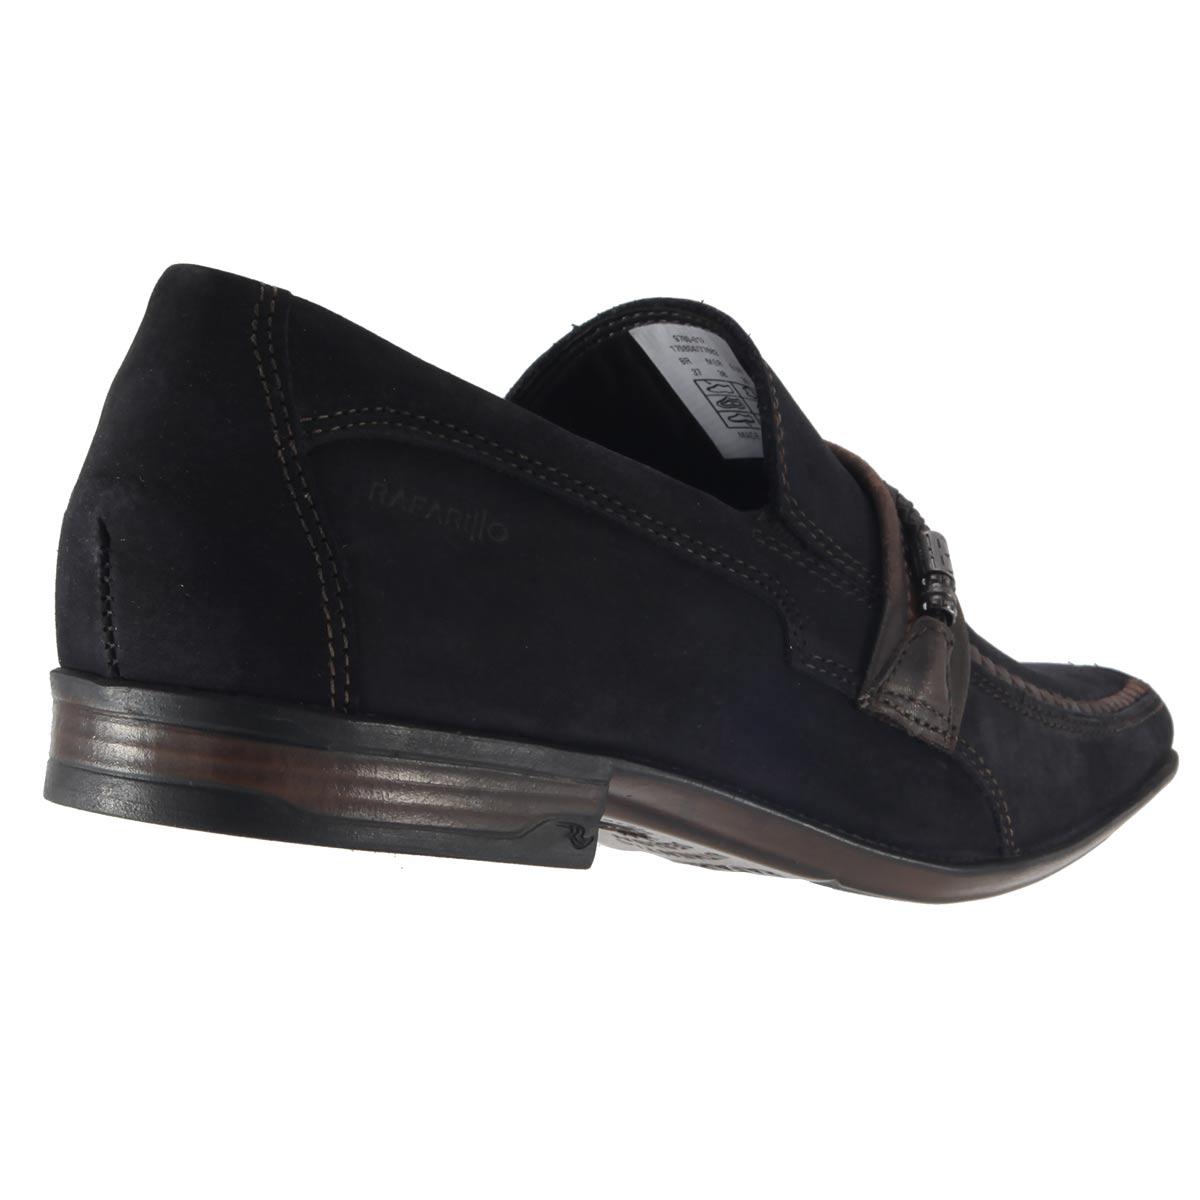 Sapato Rafarillo Masculino Couro Vegetal Natural Nobuck 9780